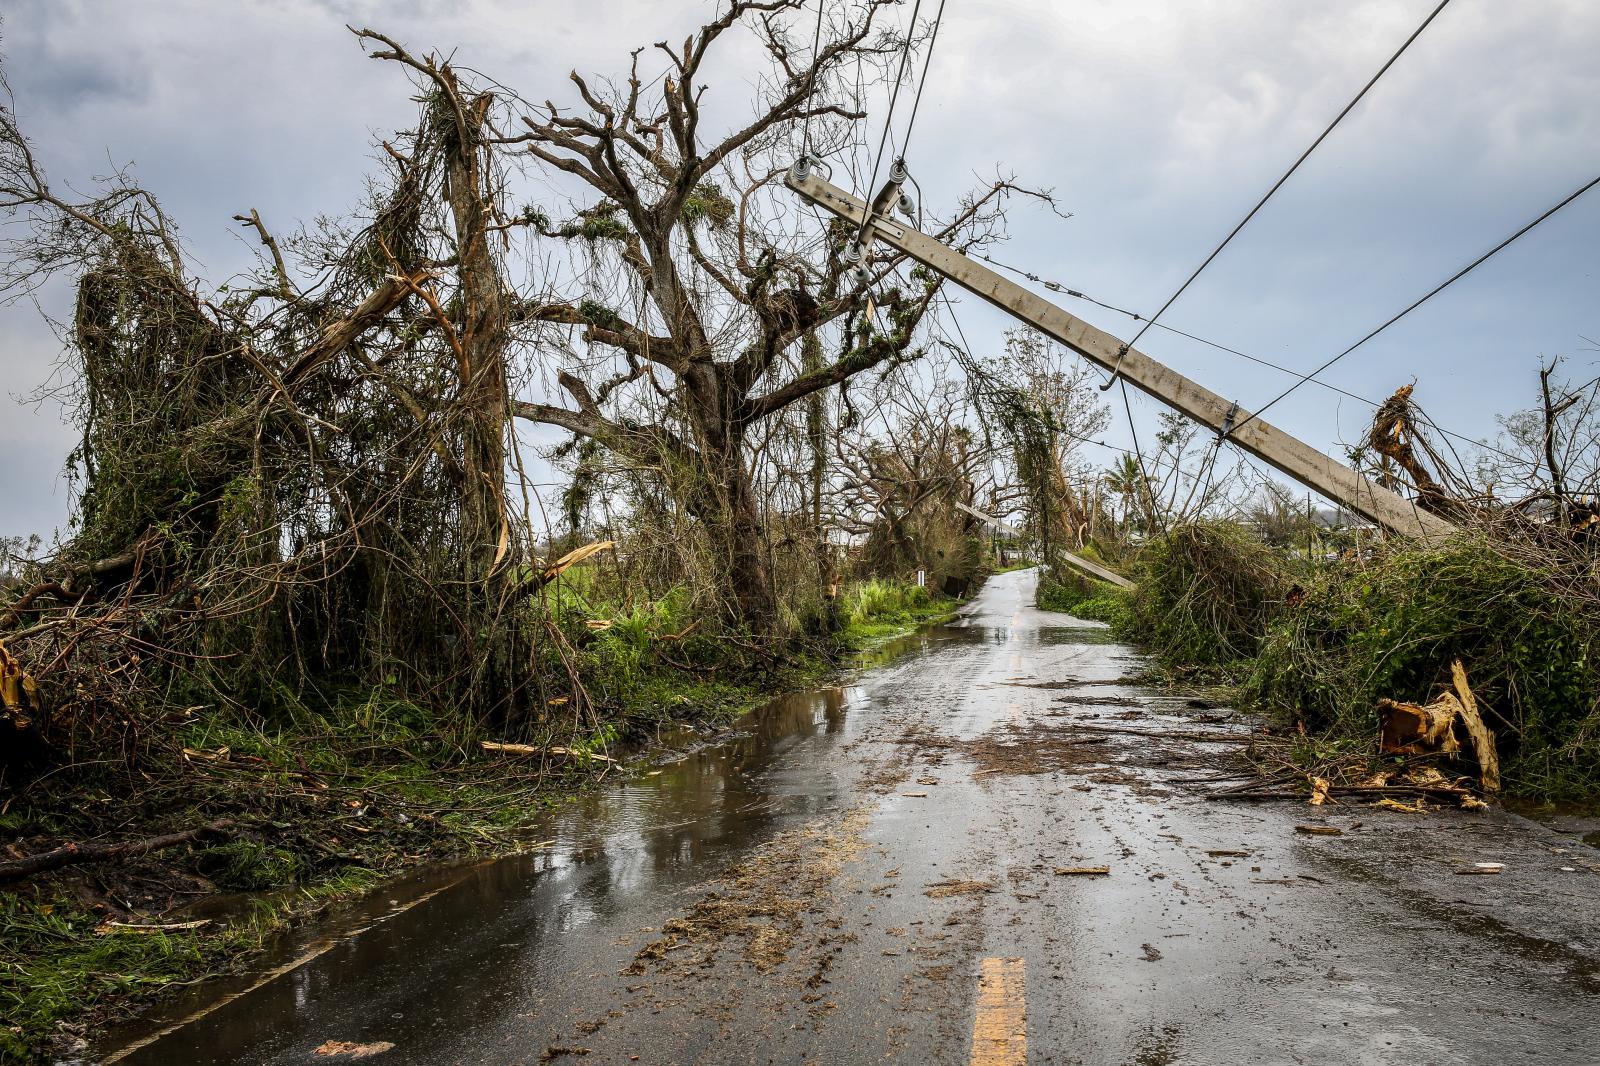 20 de septiembre de 2017. Paso de huracán María por el Municipio de Dorado.